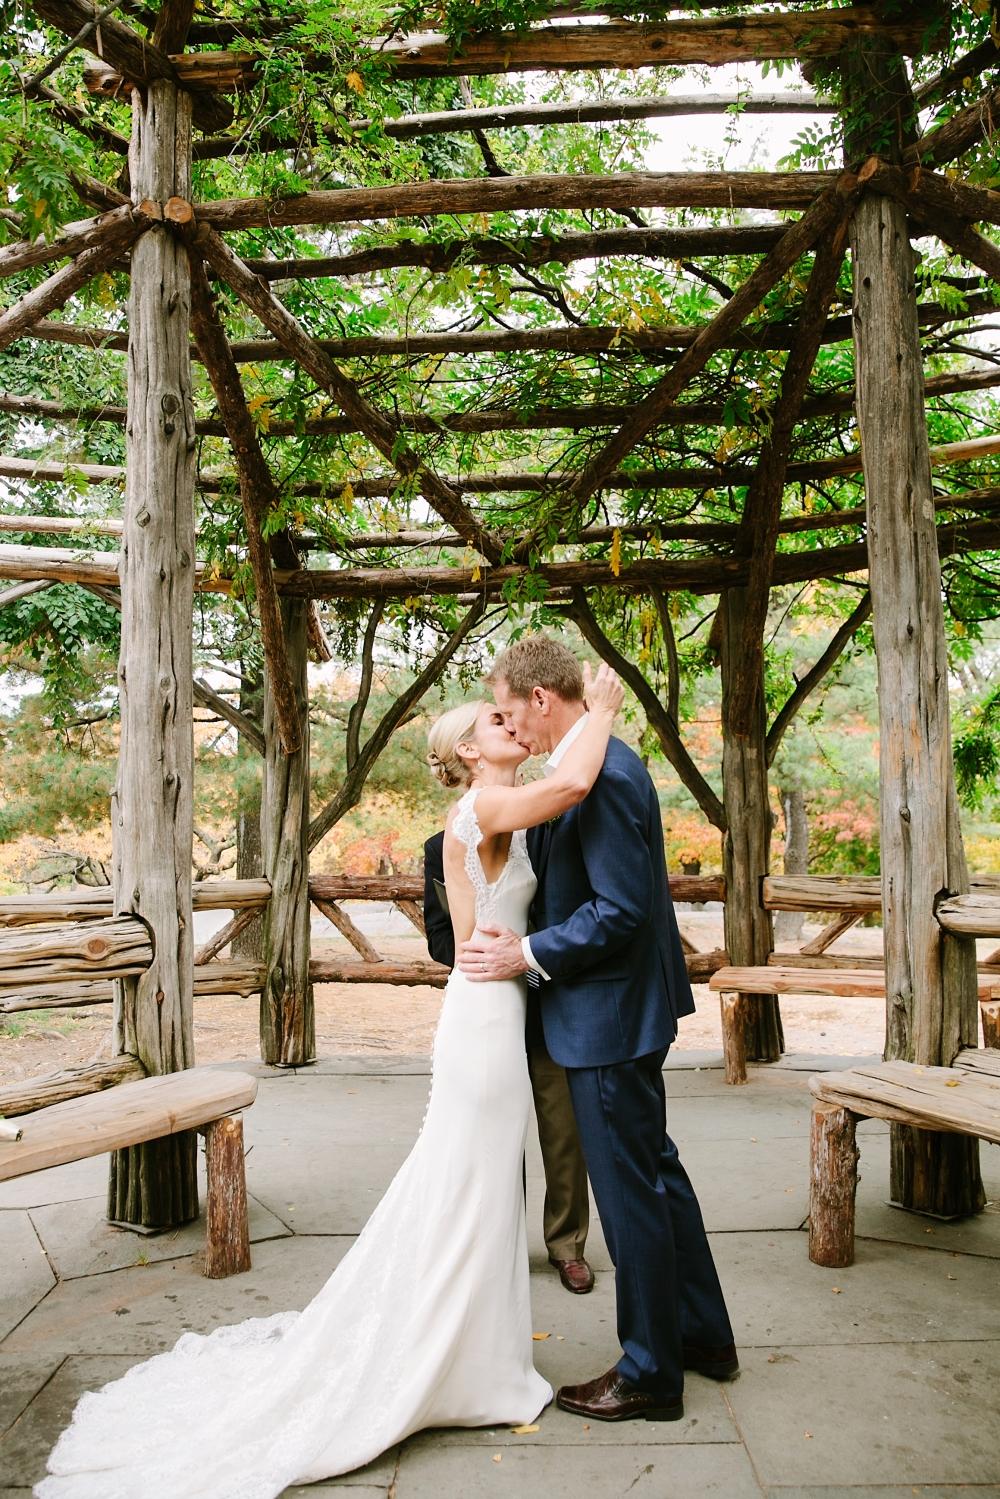 Copcot_centralpark_wedding_TS-26